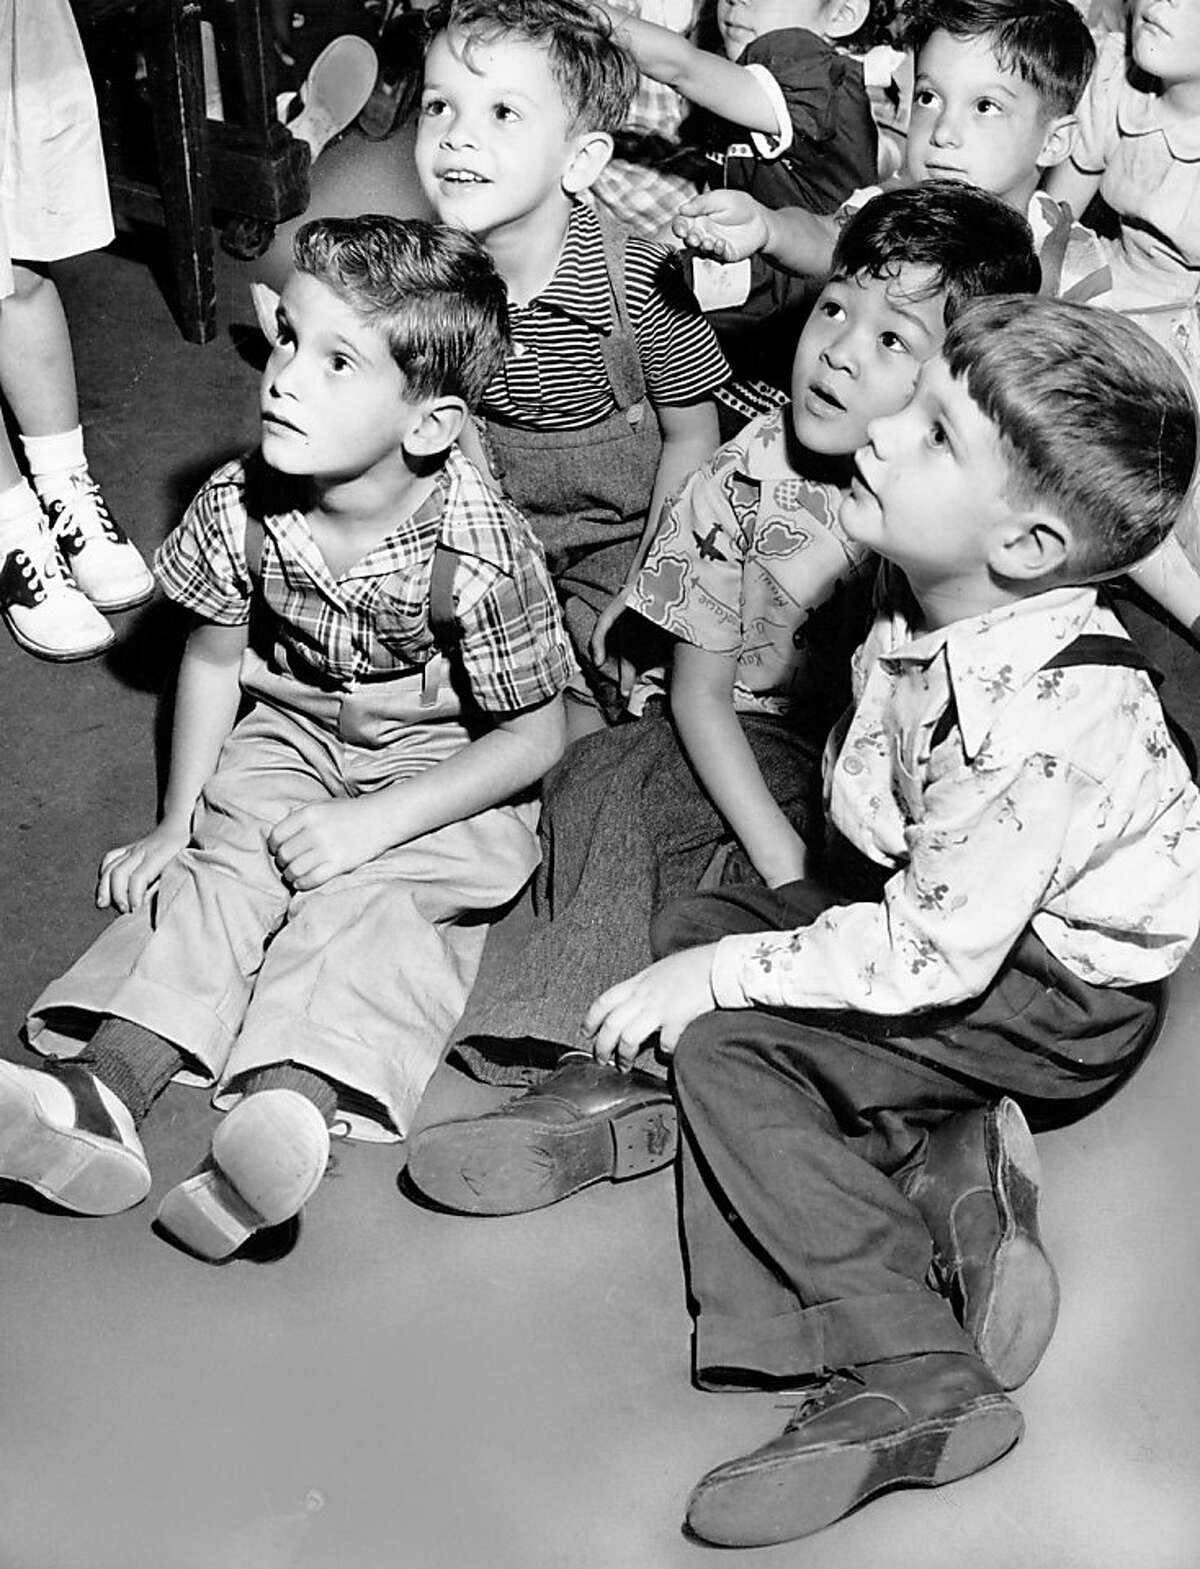 Children enjoying their first day of kindergarten at a Richmond District school in San Francisco. Sept. 8, 1949.